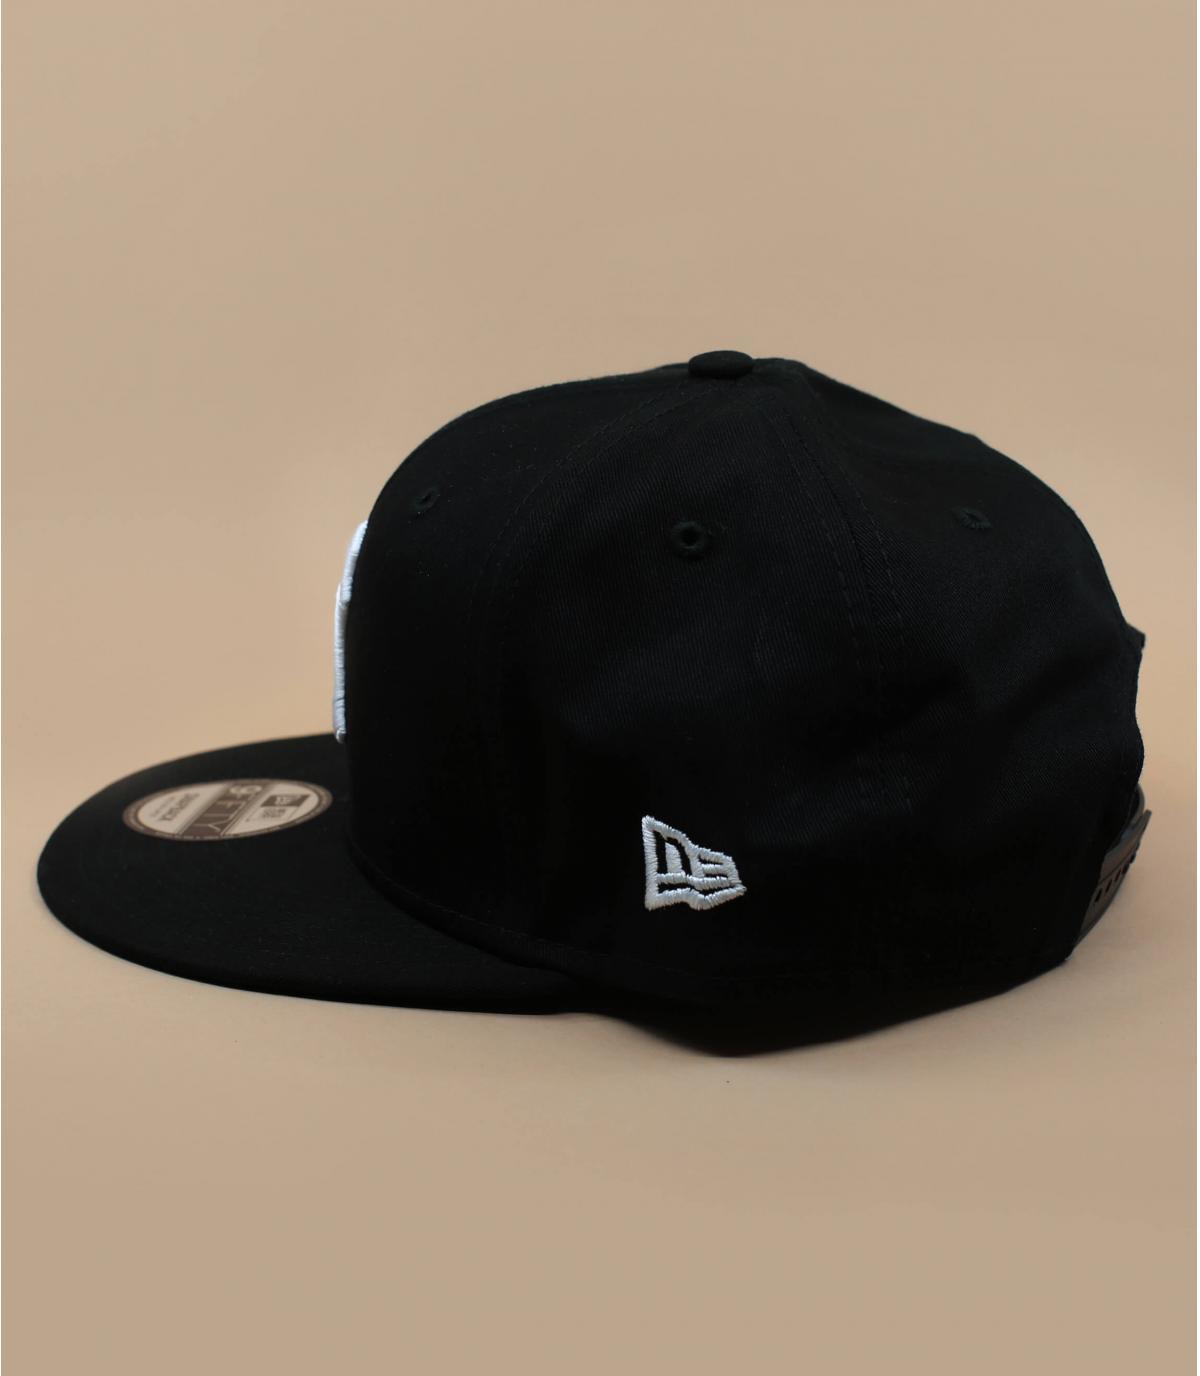 Détails Snapback NY MLB black white - image 3